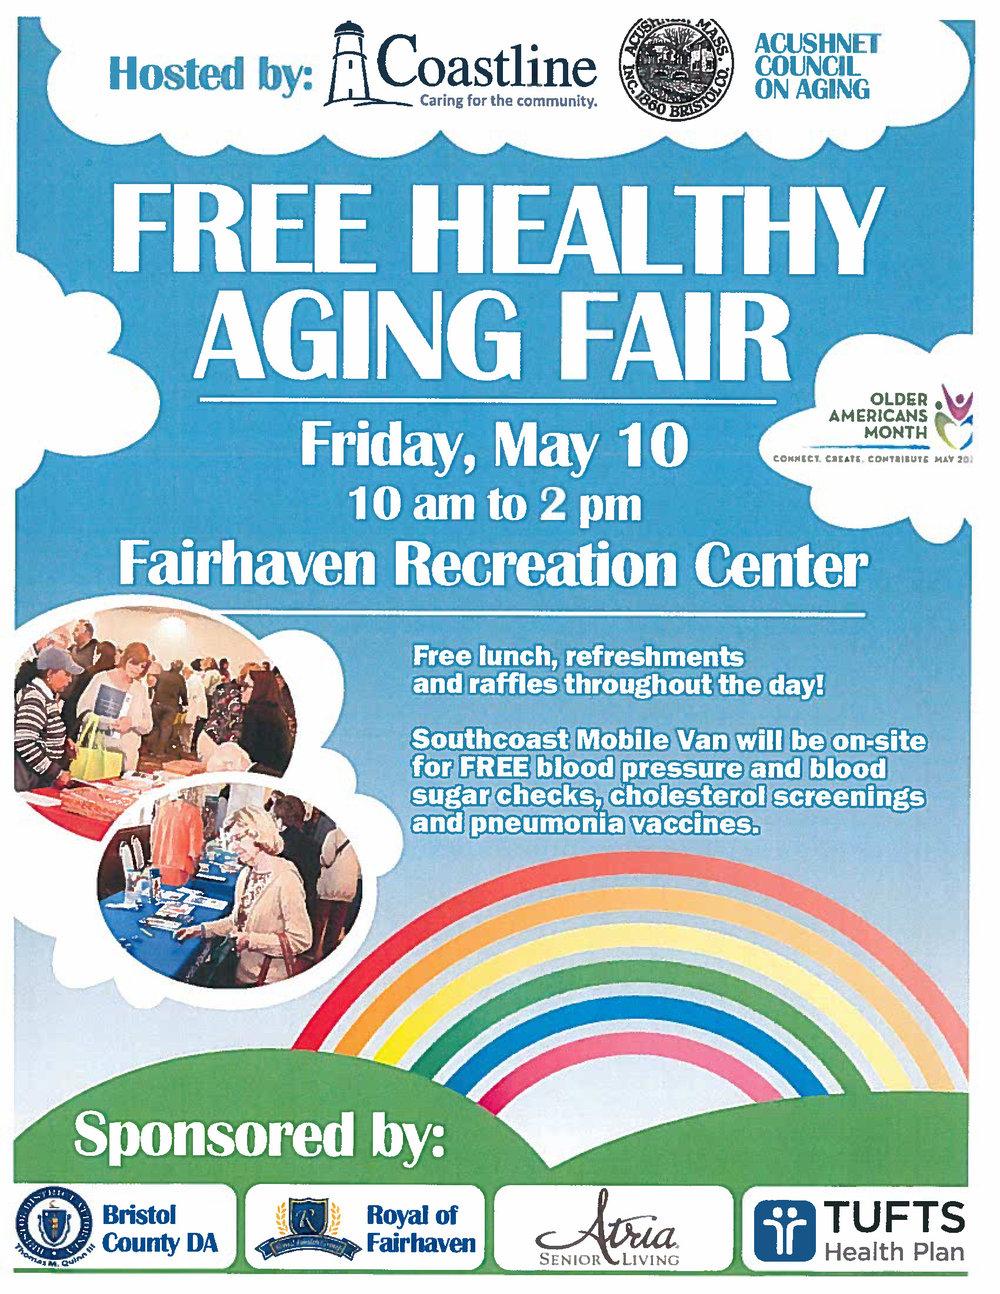 Coastline - Fairhaven Healthy Aging Fair Flyer.jpg